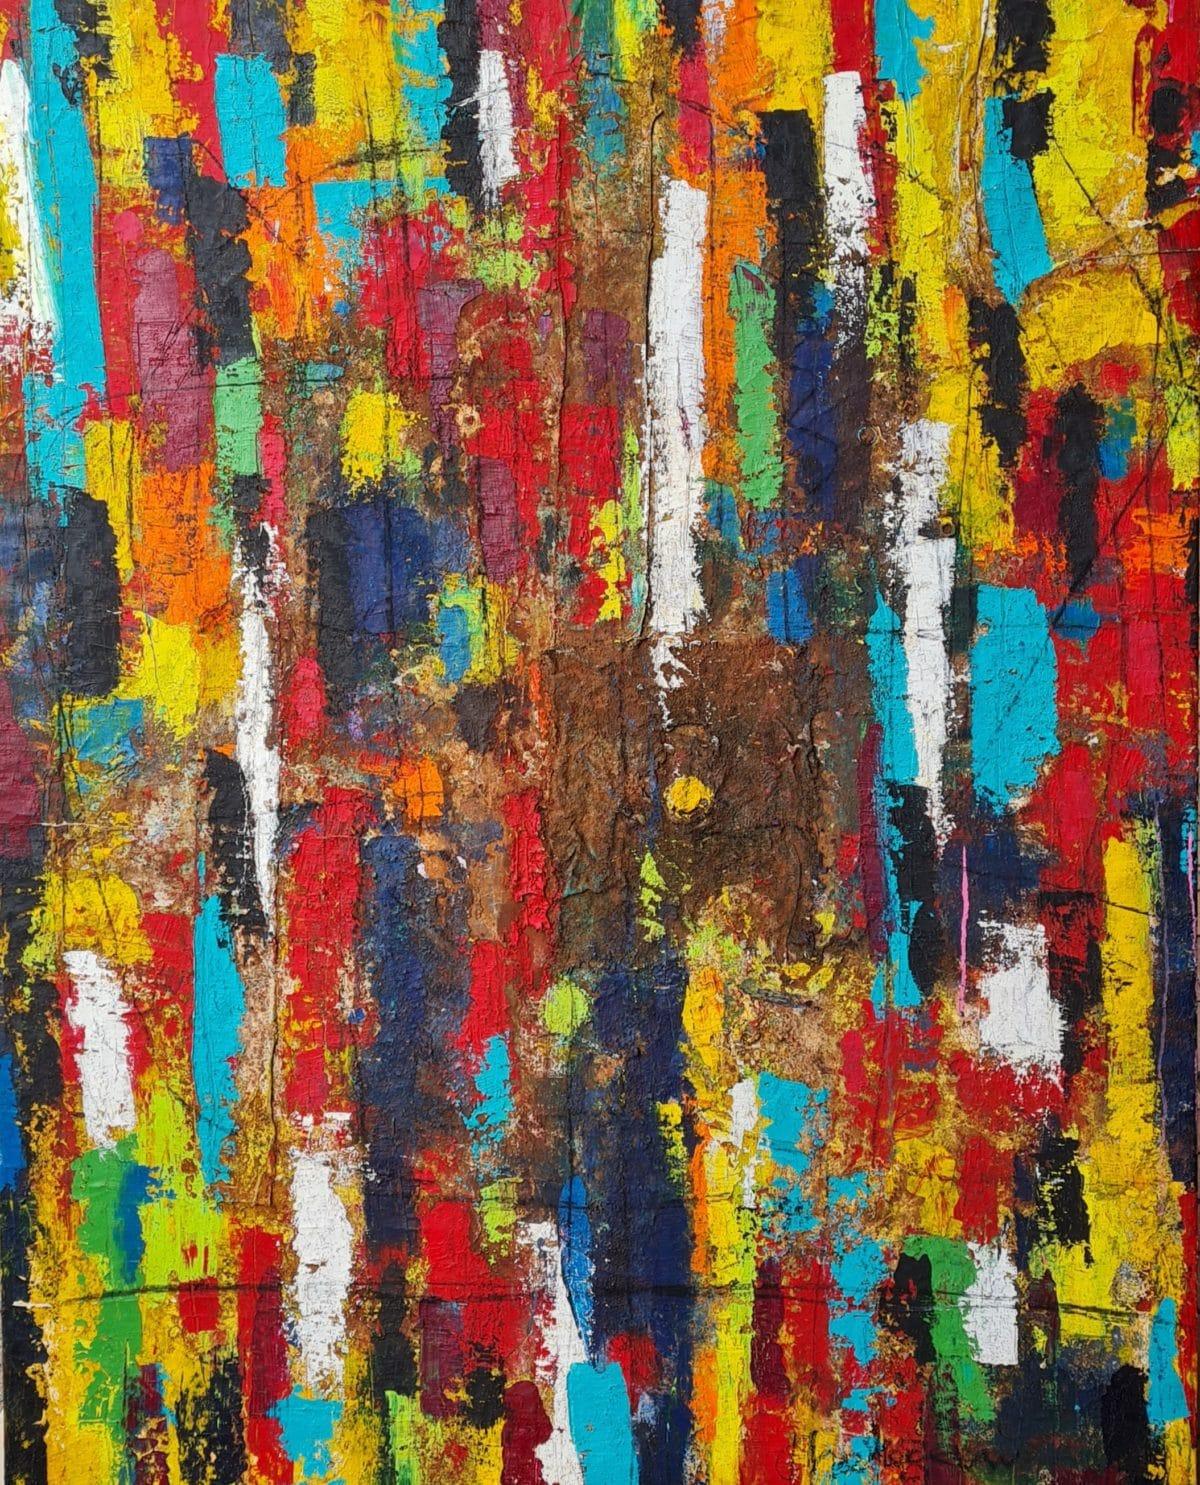 Thokozani Mthiyane - Layers of Light in a Sea of Colour